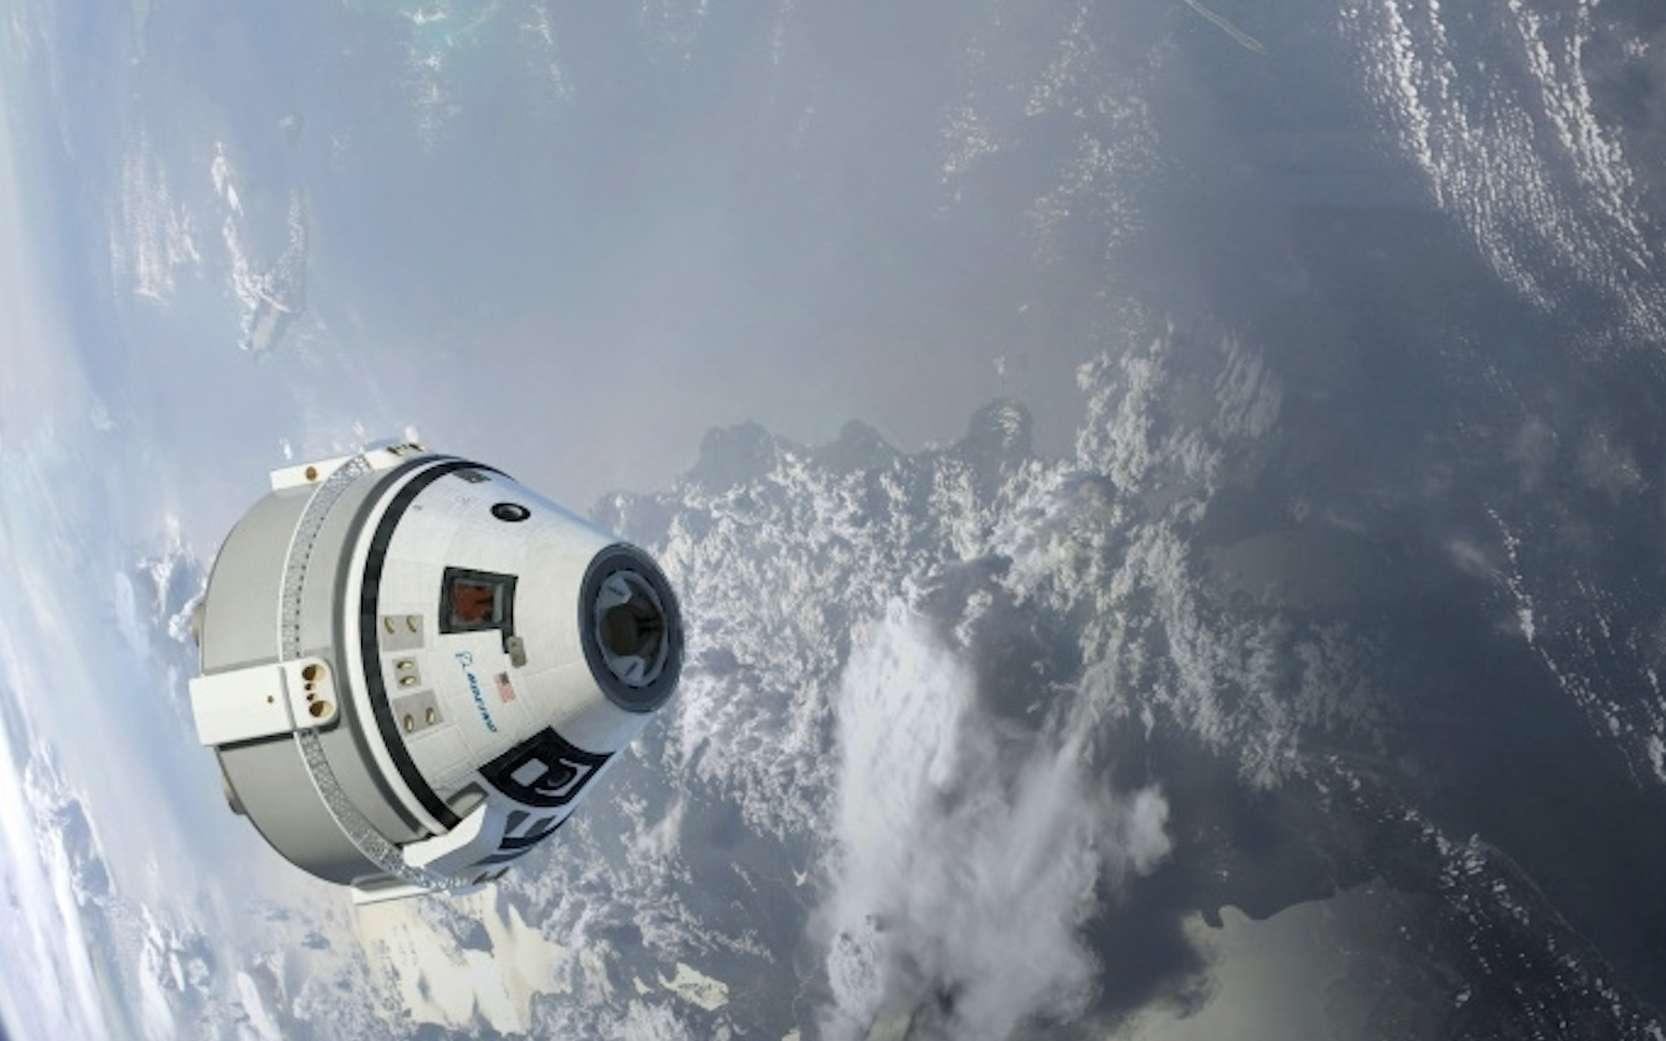 La capsule Starliner en orbite autour de la Terre, fournie par Boeing en 2015. © HO, Nasa, Boeing, AFP